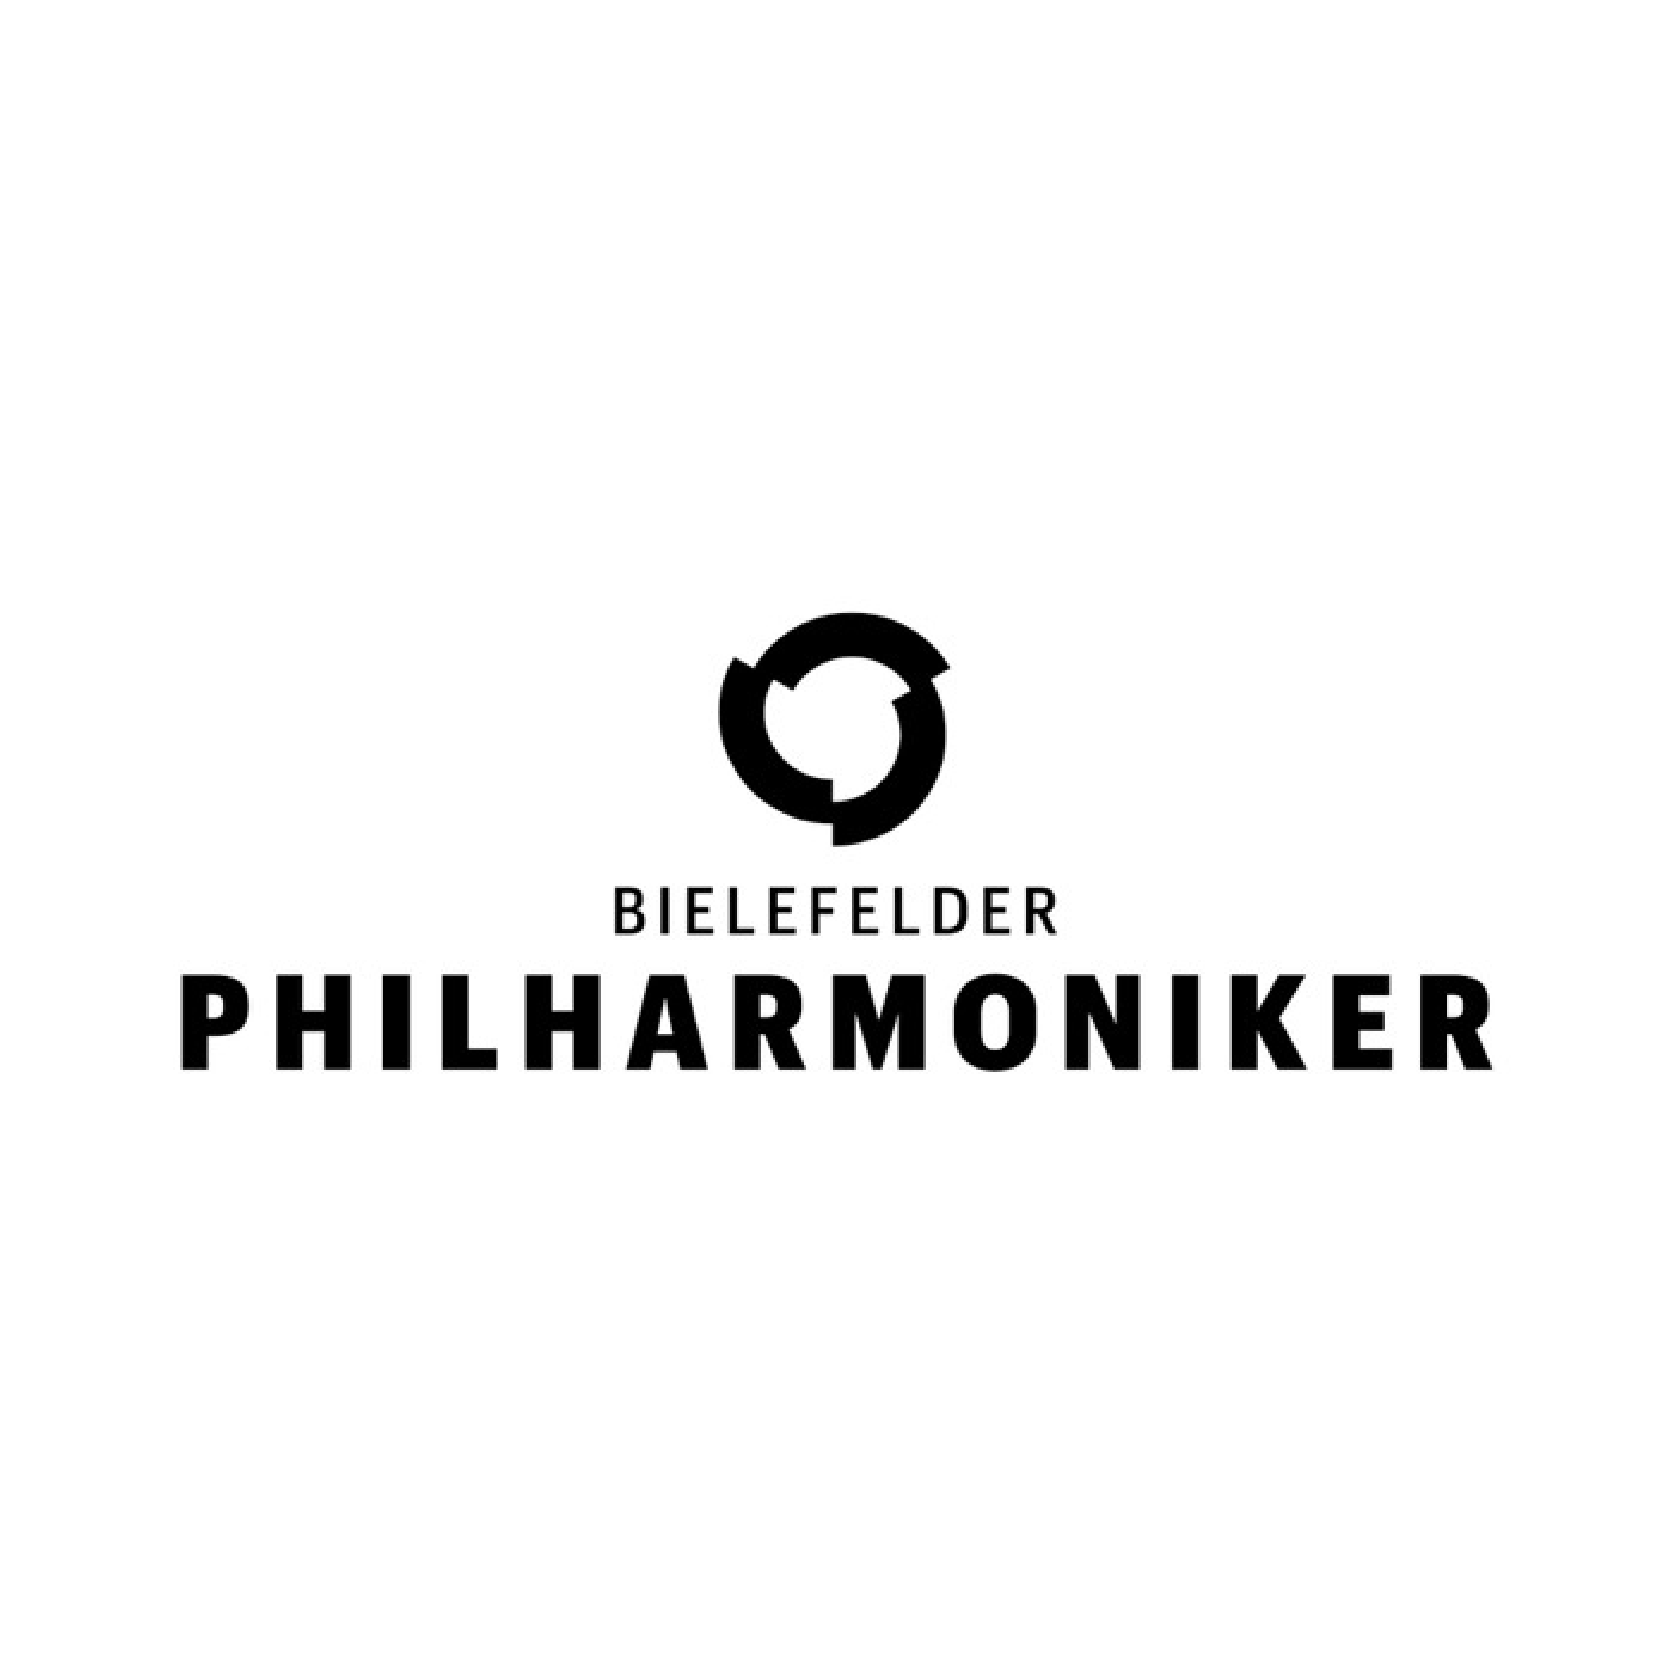 Bielefelder Philharmoniker Logo Agentur